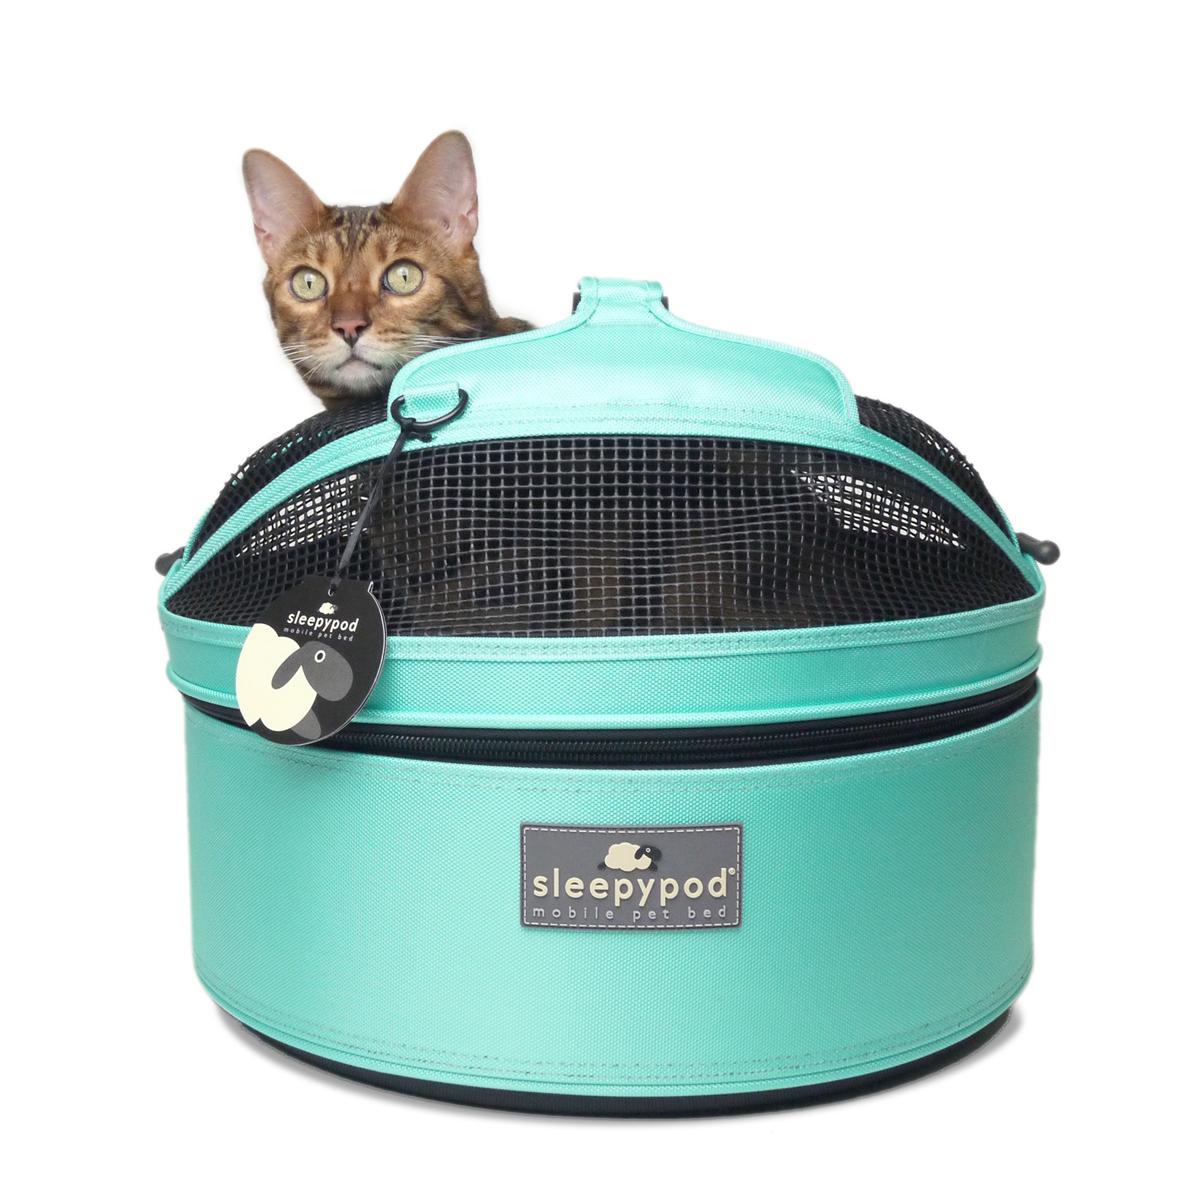 Best Cat Carrier For Flight